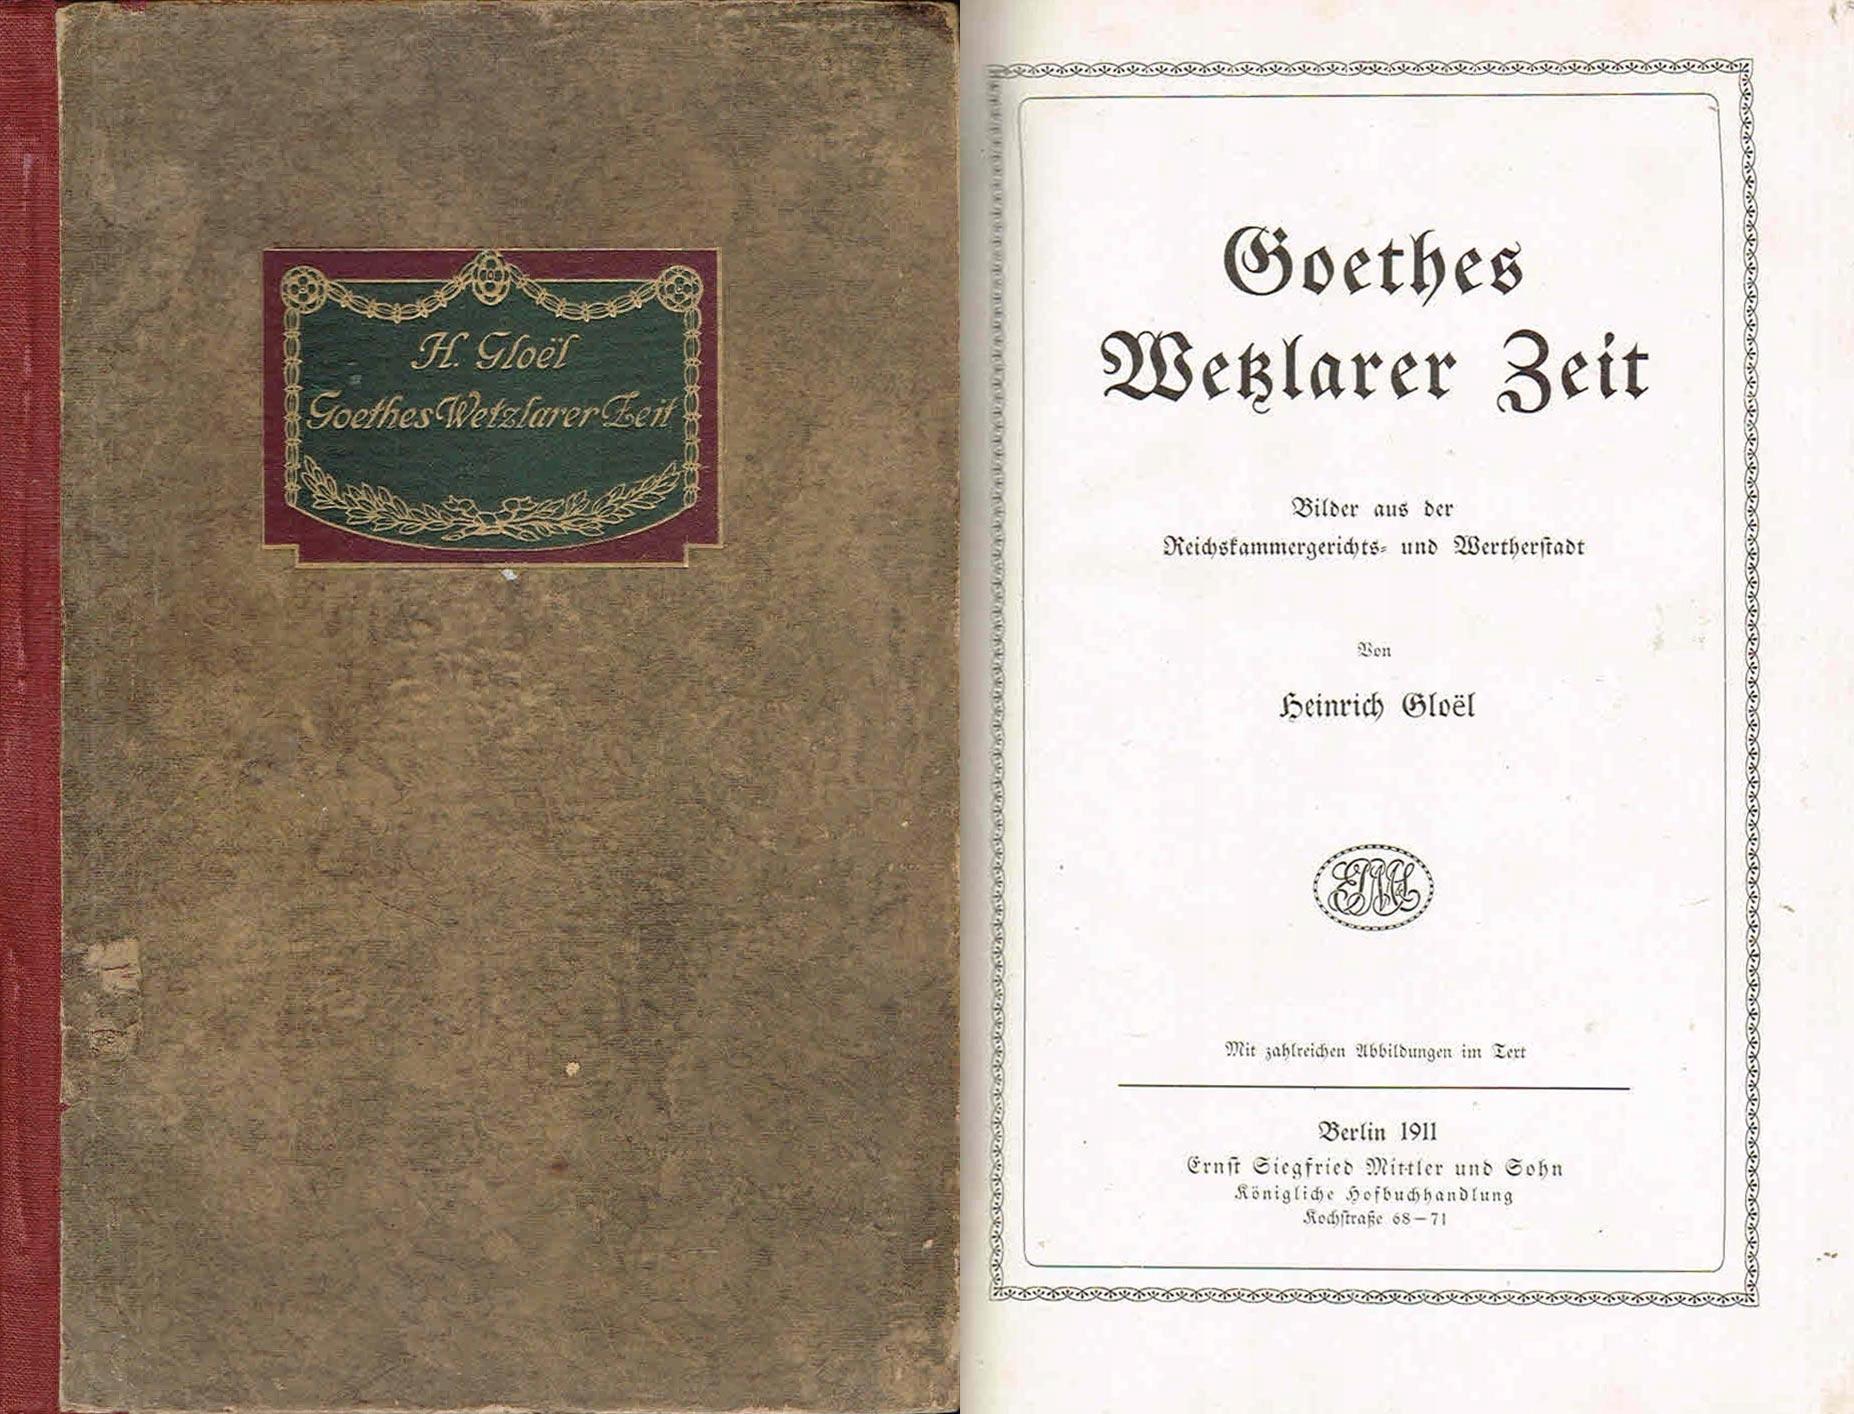 == Gloel - Goethes Wetzlarer Zeit [1911] GOETHE ==